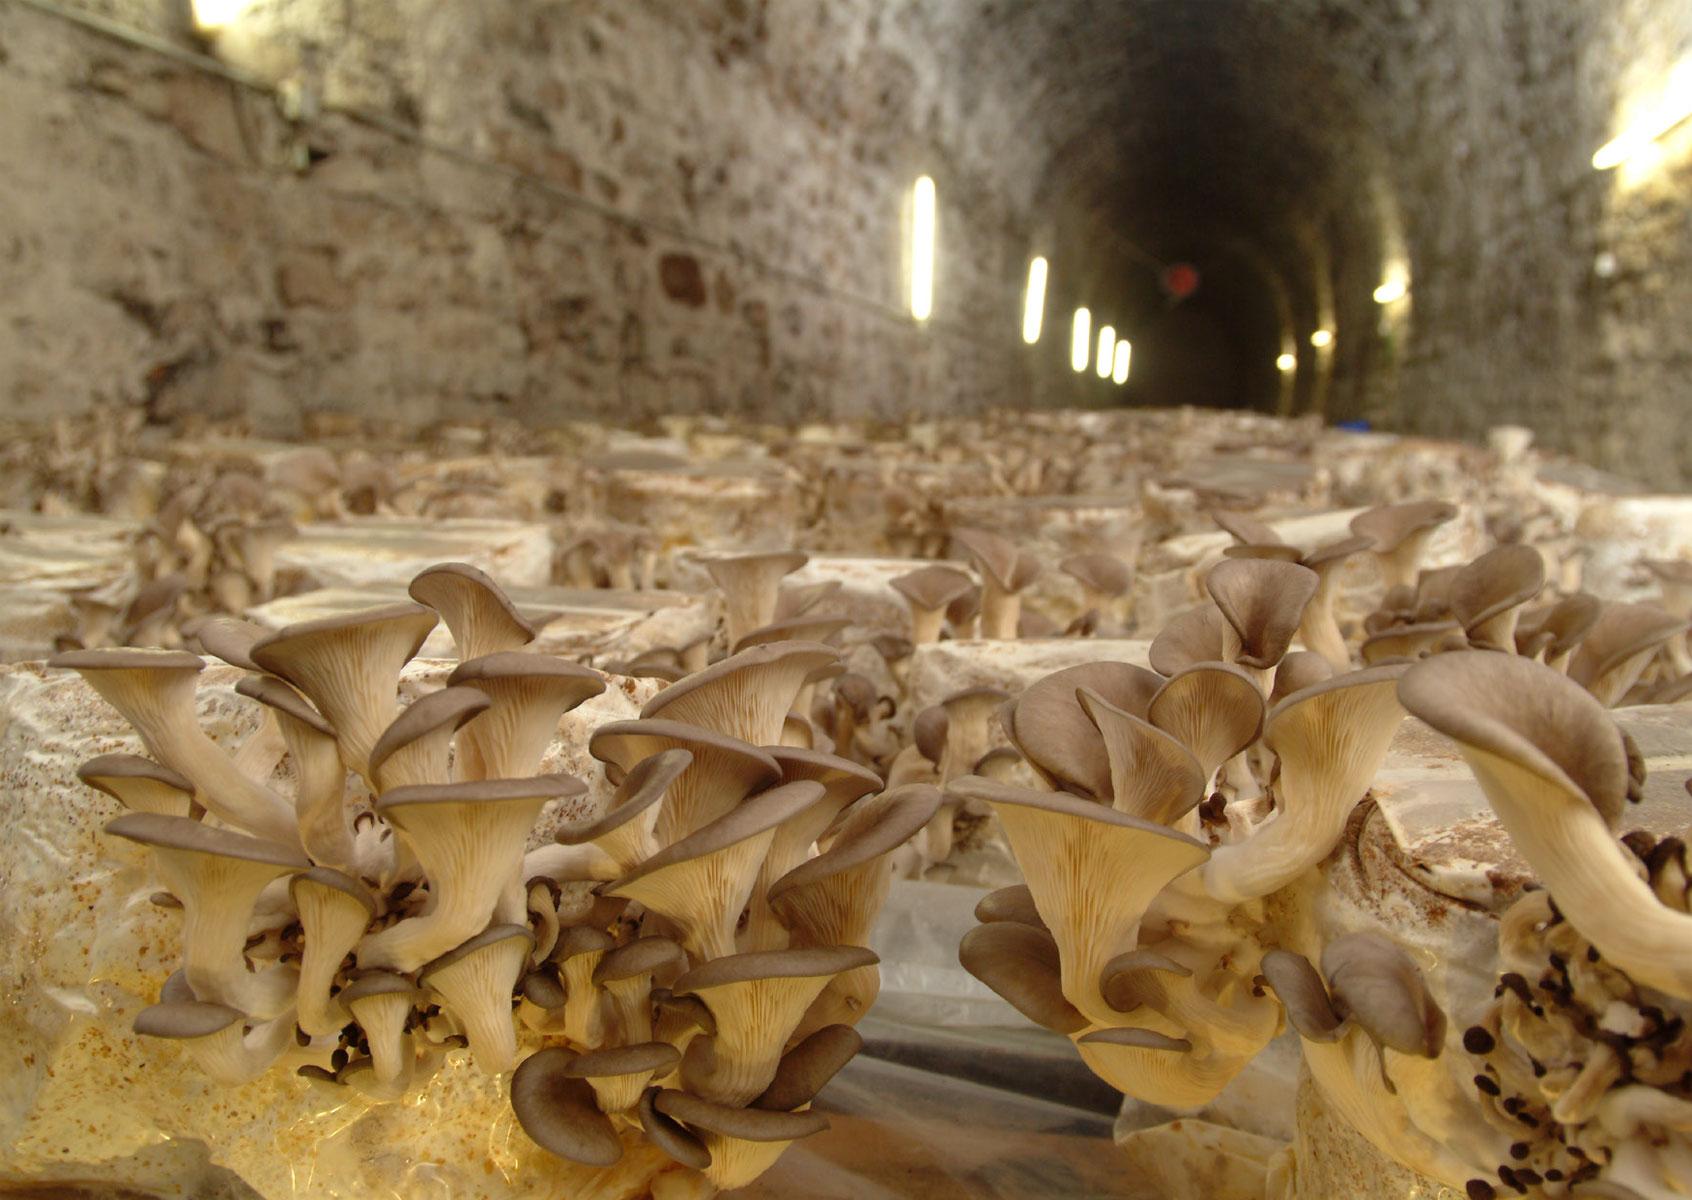 Pilze im Zuchttunnel